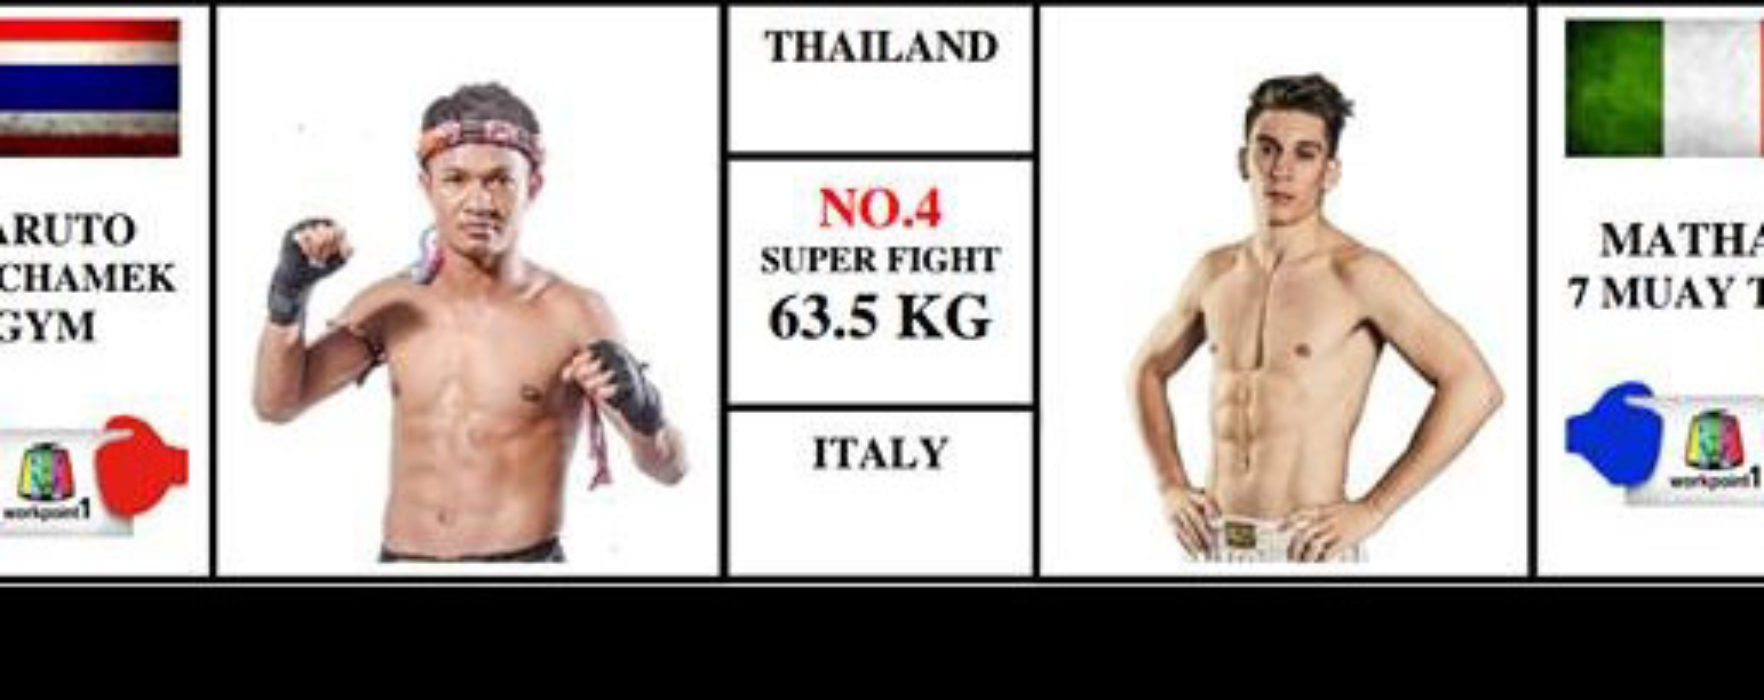 (English) Card / Steaming: Mathias Gallo Cassarino vs Naruto Banchamek – Super Muay Thai – 29/05/16